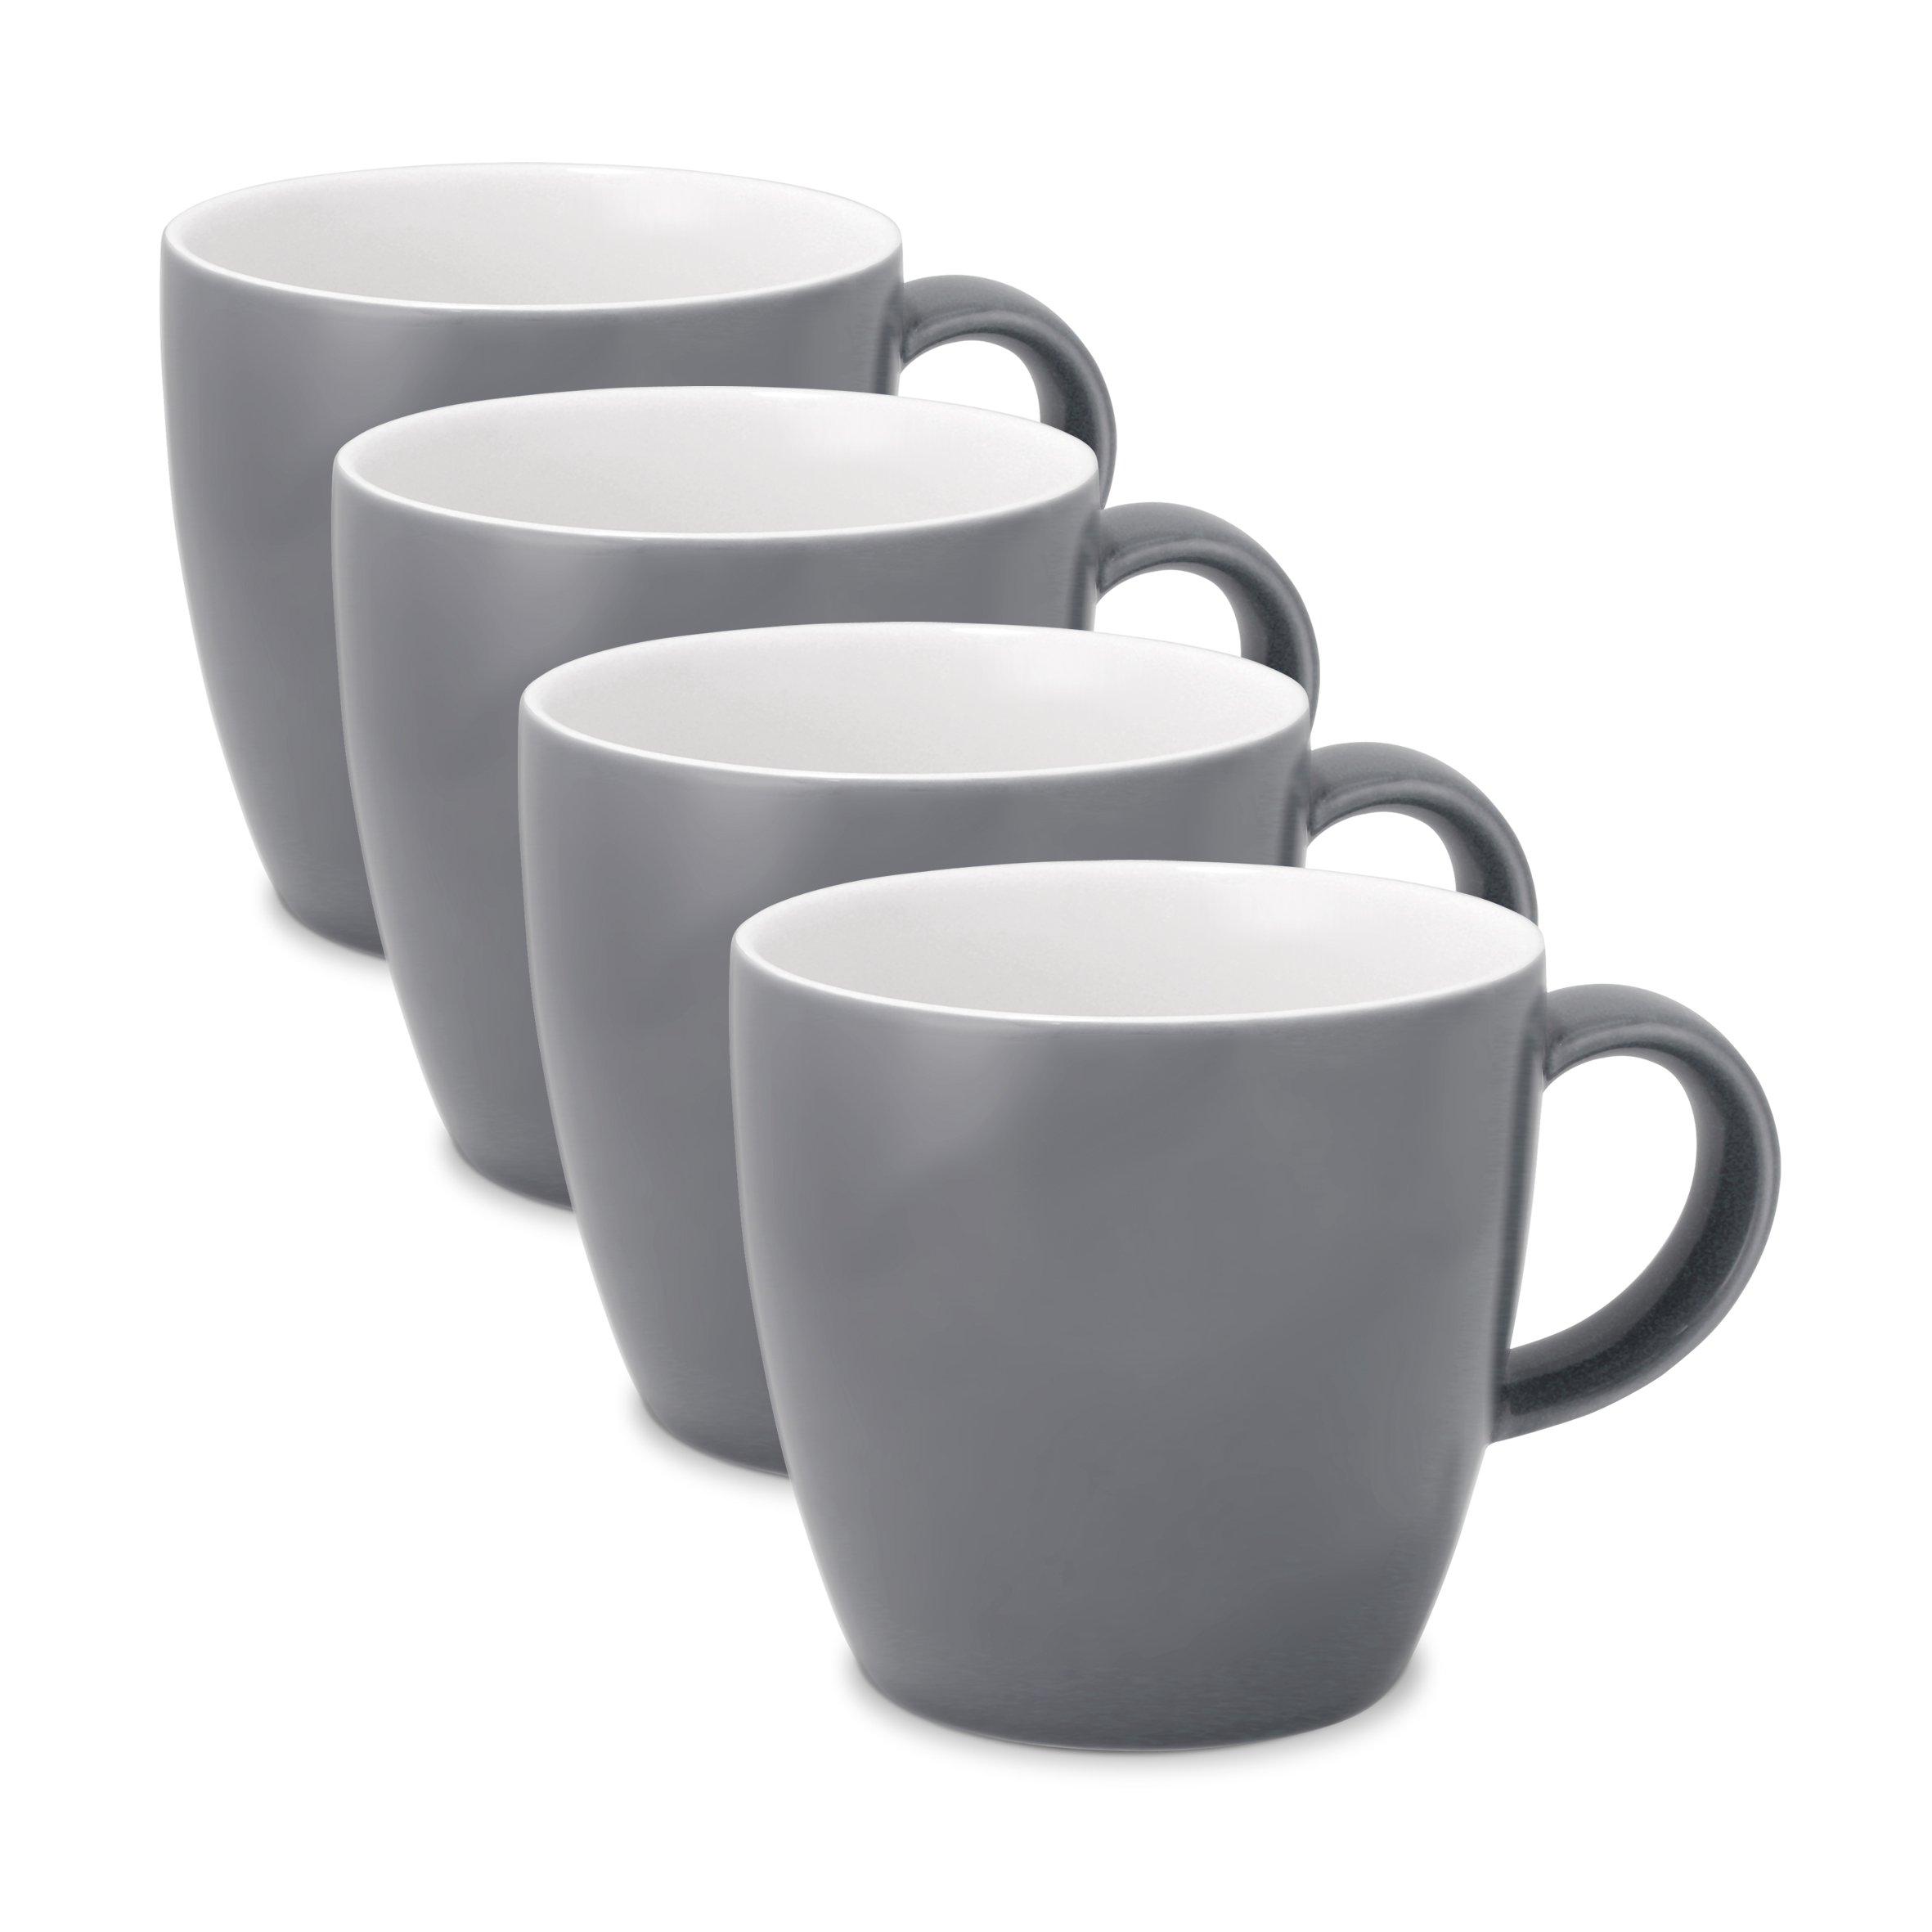 FORLIFE Uni Espresso/Oolong Tea Cup (Set of 4), 3.5 oz., Gray